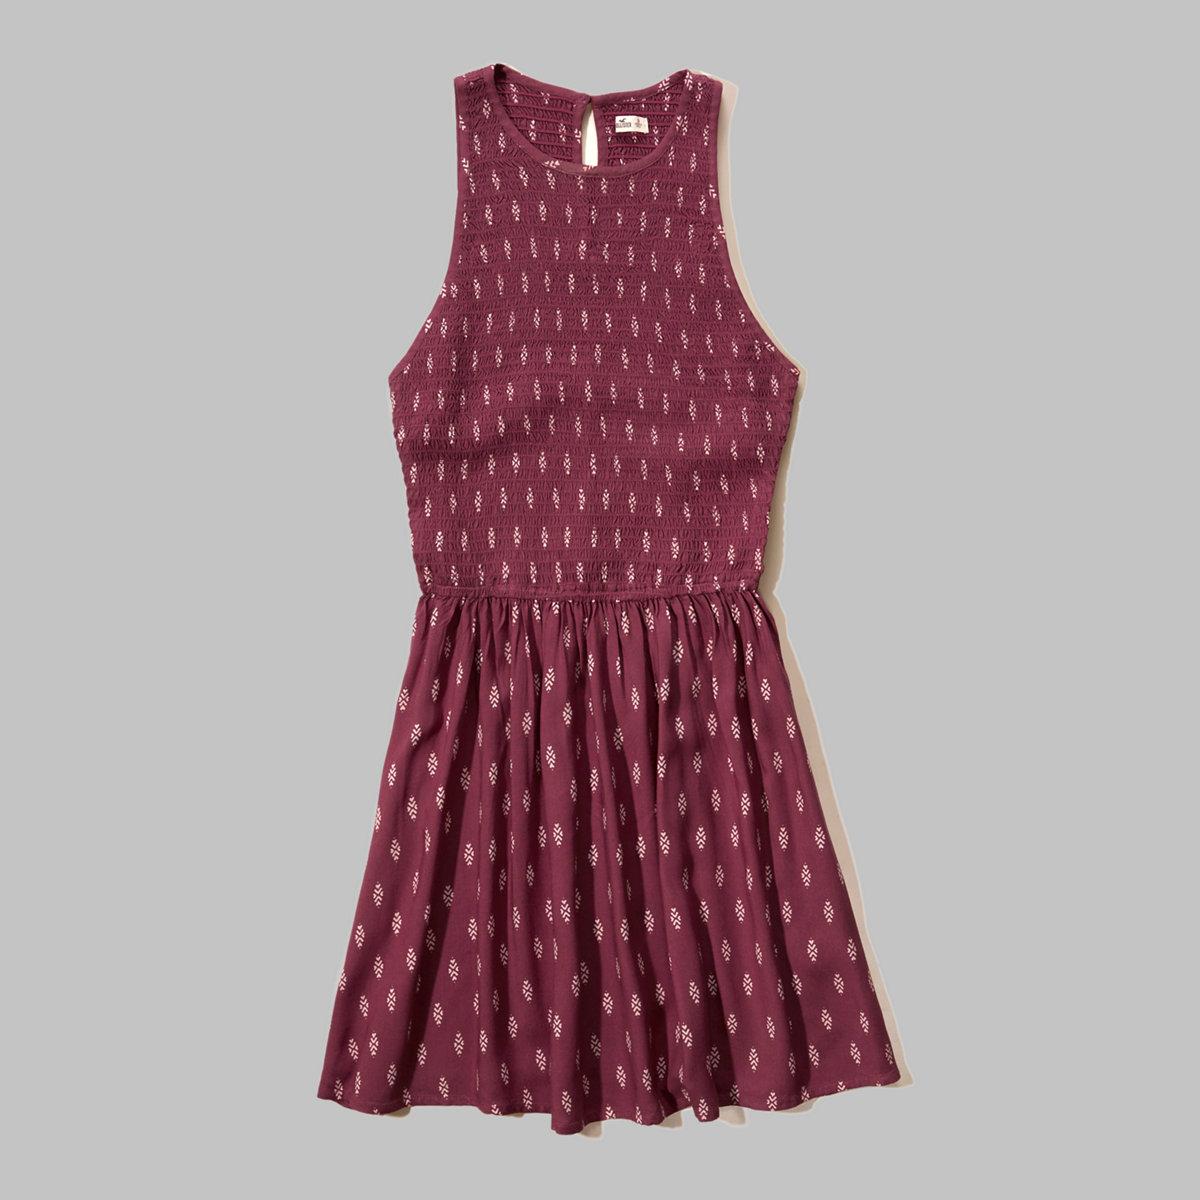 Smocked Rayon Skater Dress